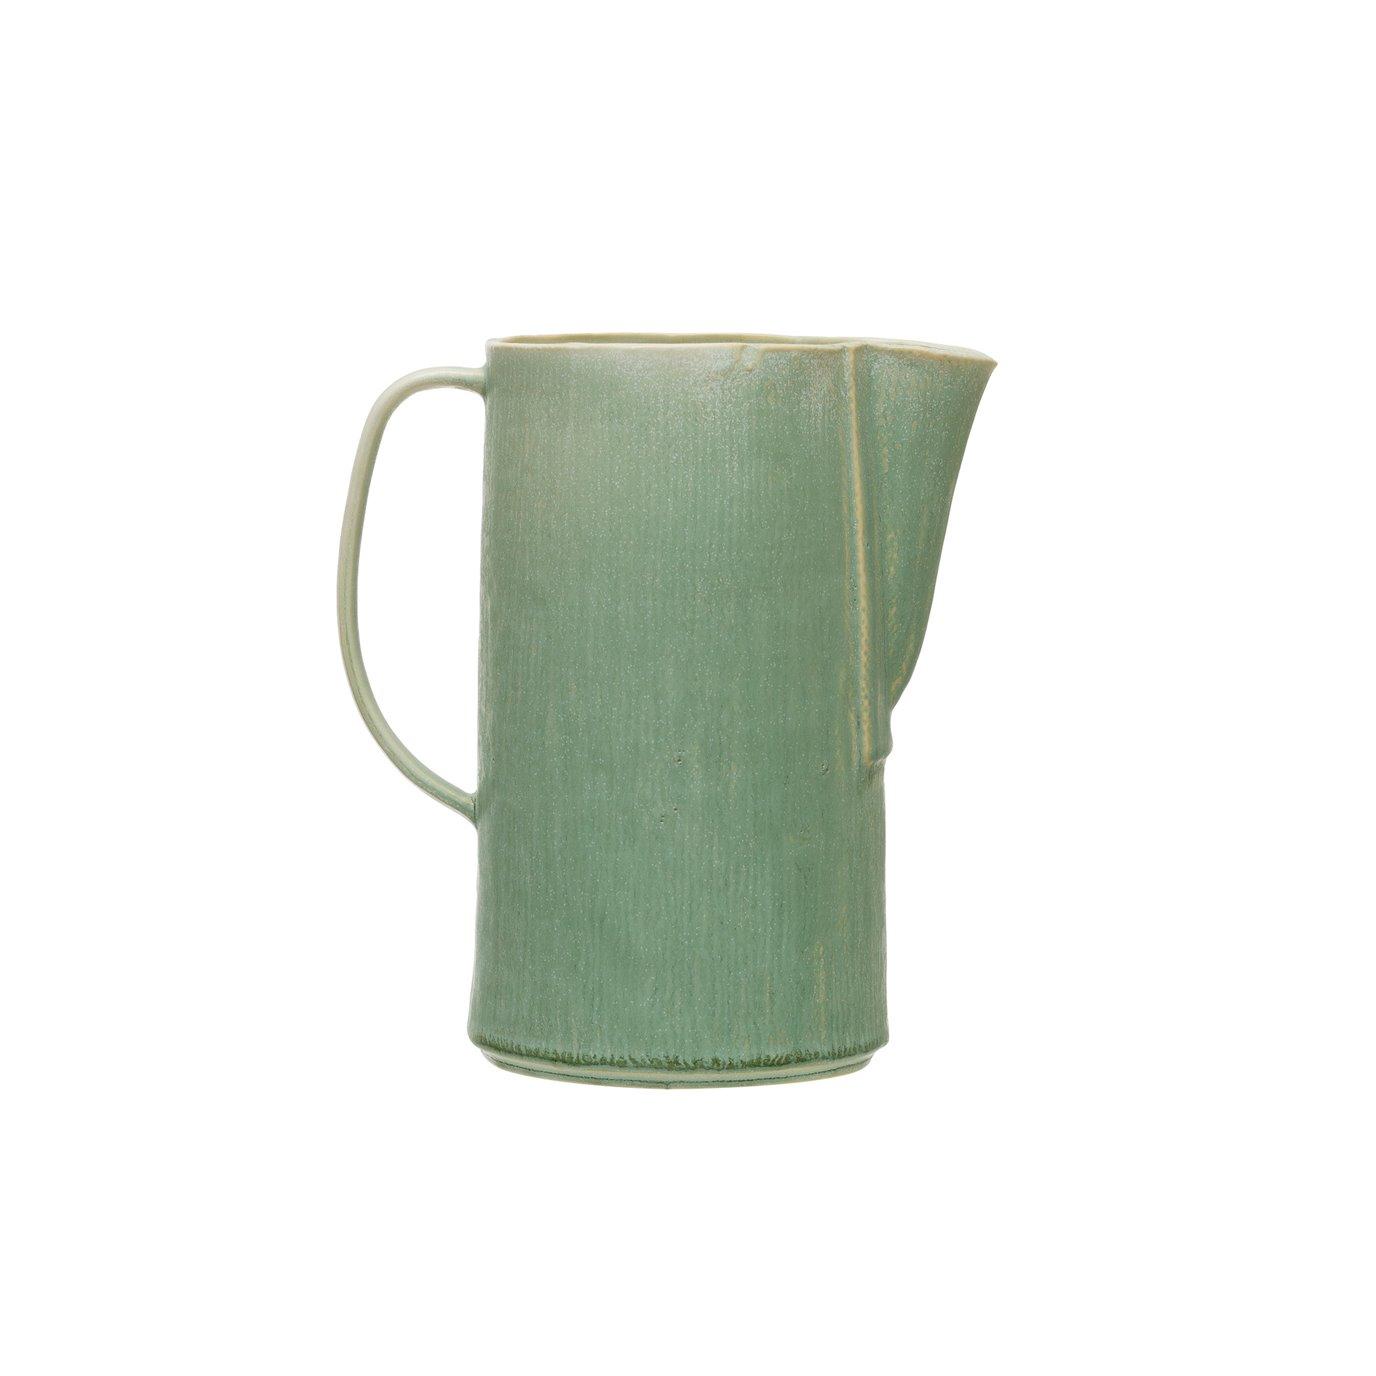 Celadon Stoneware Pitcher